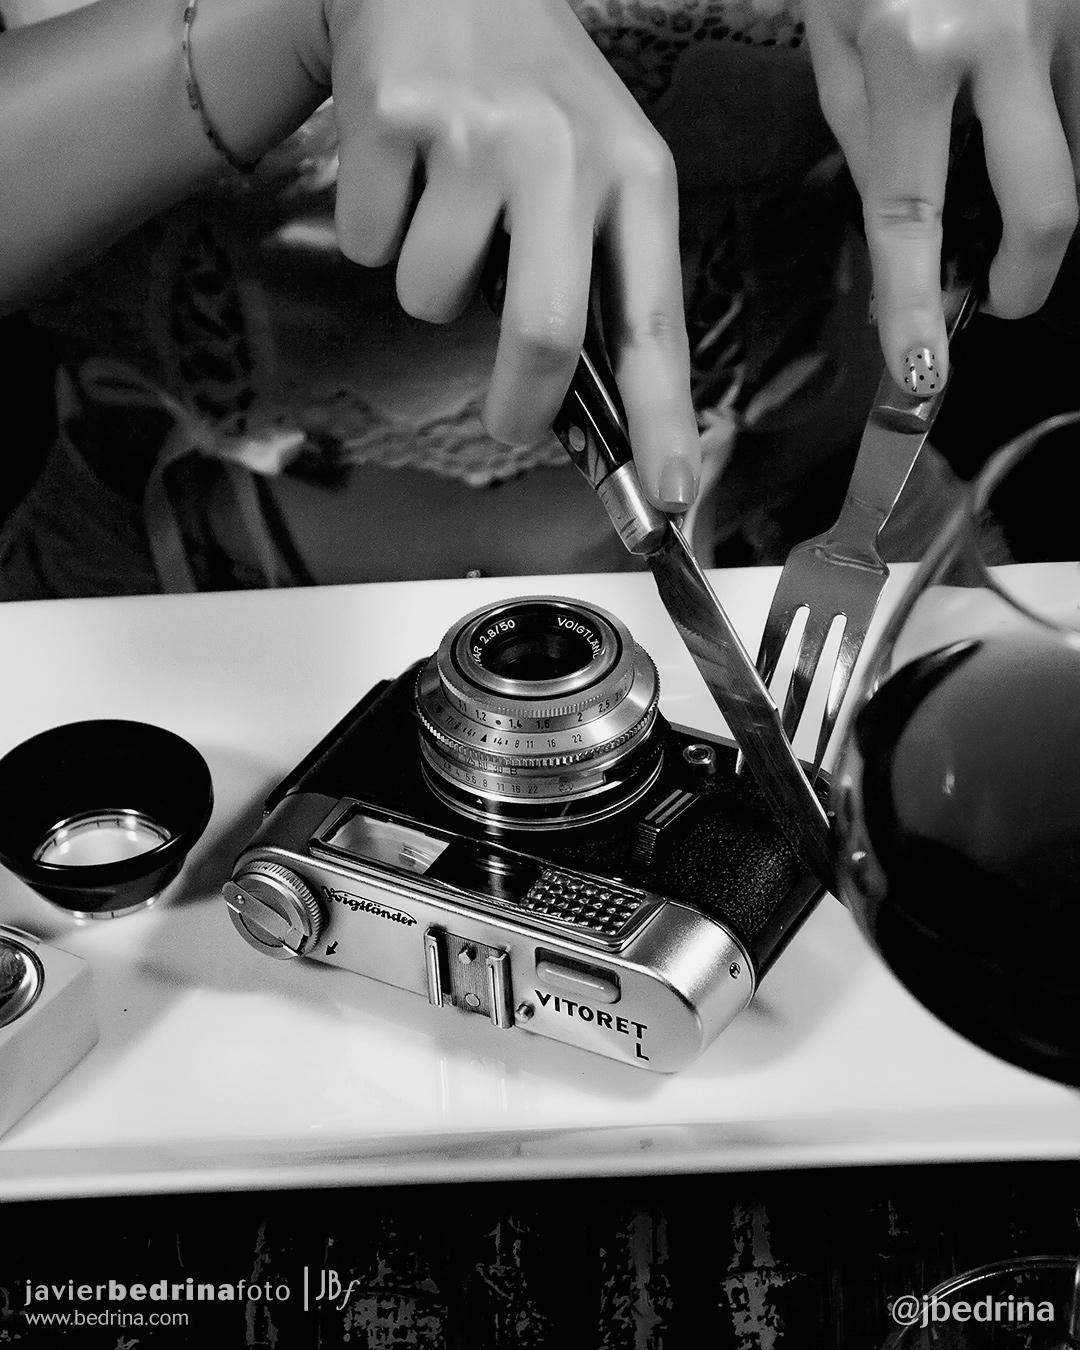 Dinner Vitoret. Photography pas - jbedrina | ello